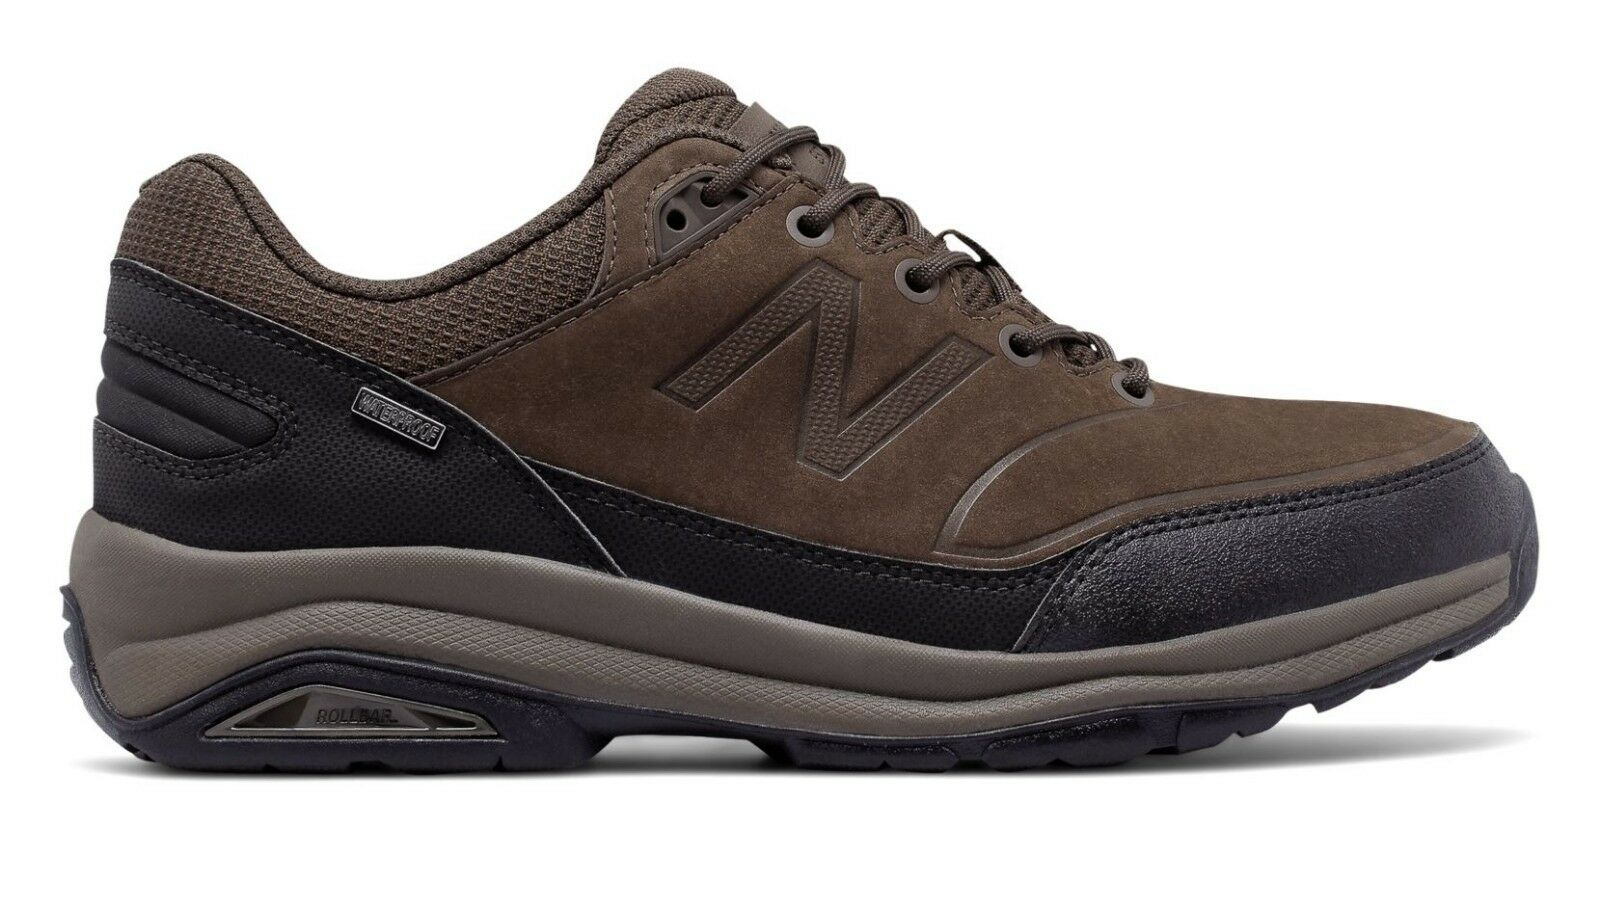 New balance MW1300DD Hombre Cuero Marrón 1300v1 NB Trail Caminar Zapatos Tenis